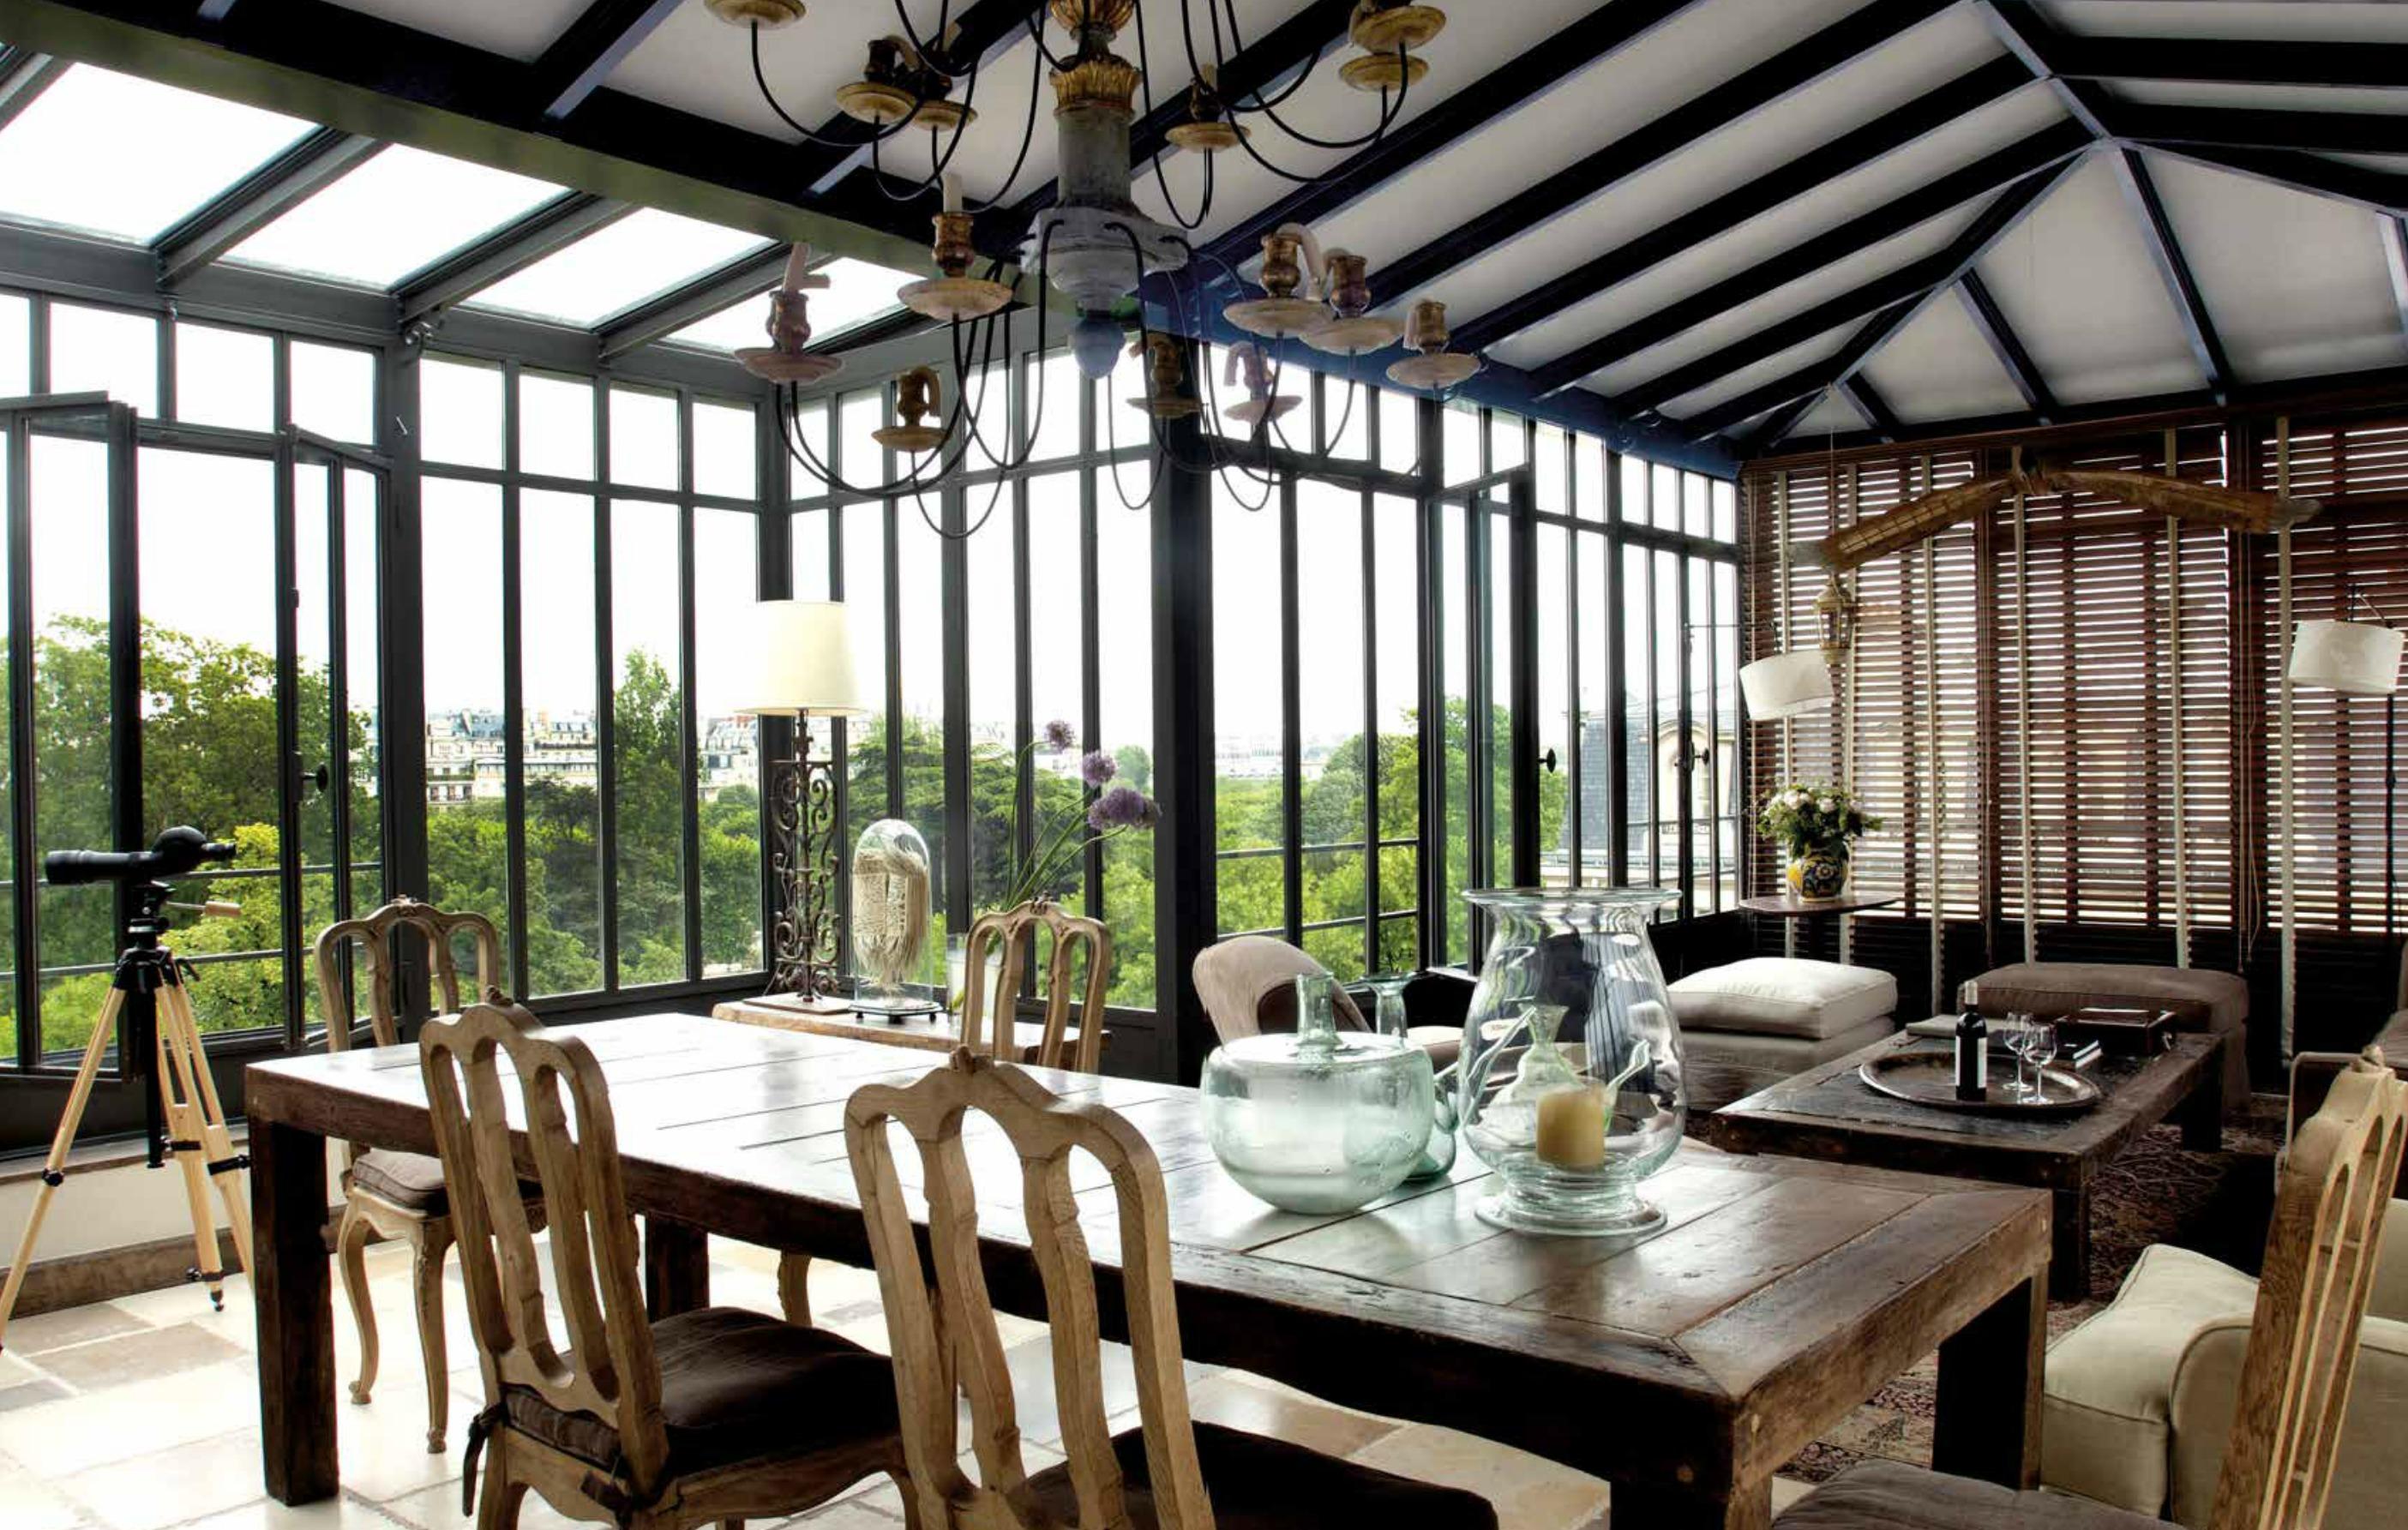 Casa a parigi aria di campagna in centro - Casa vacanza a parigi ...